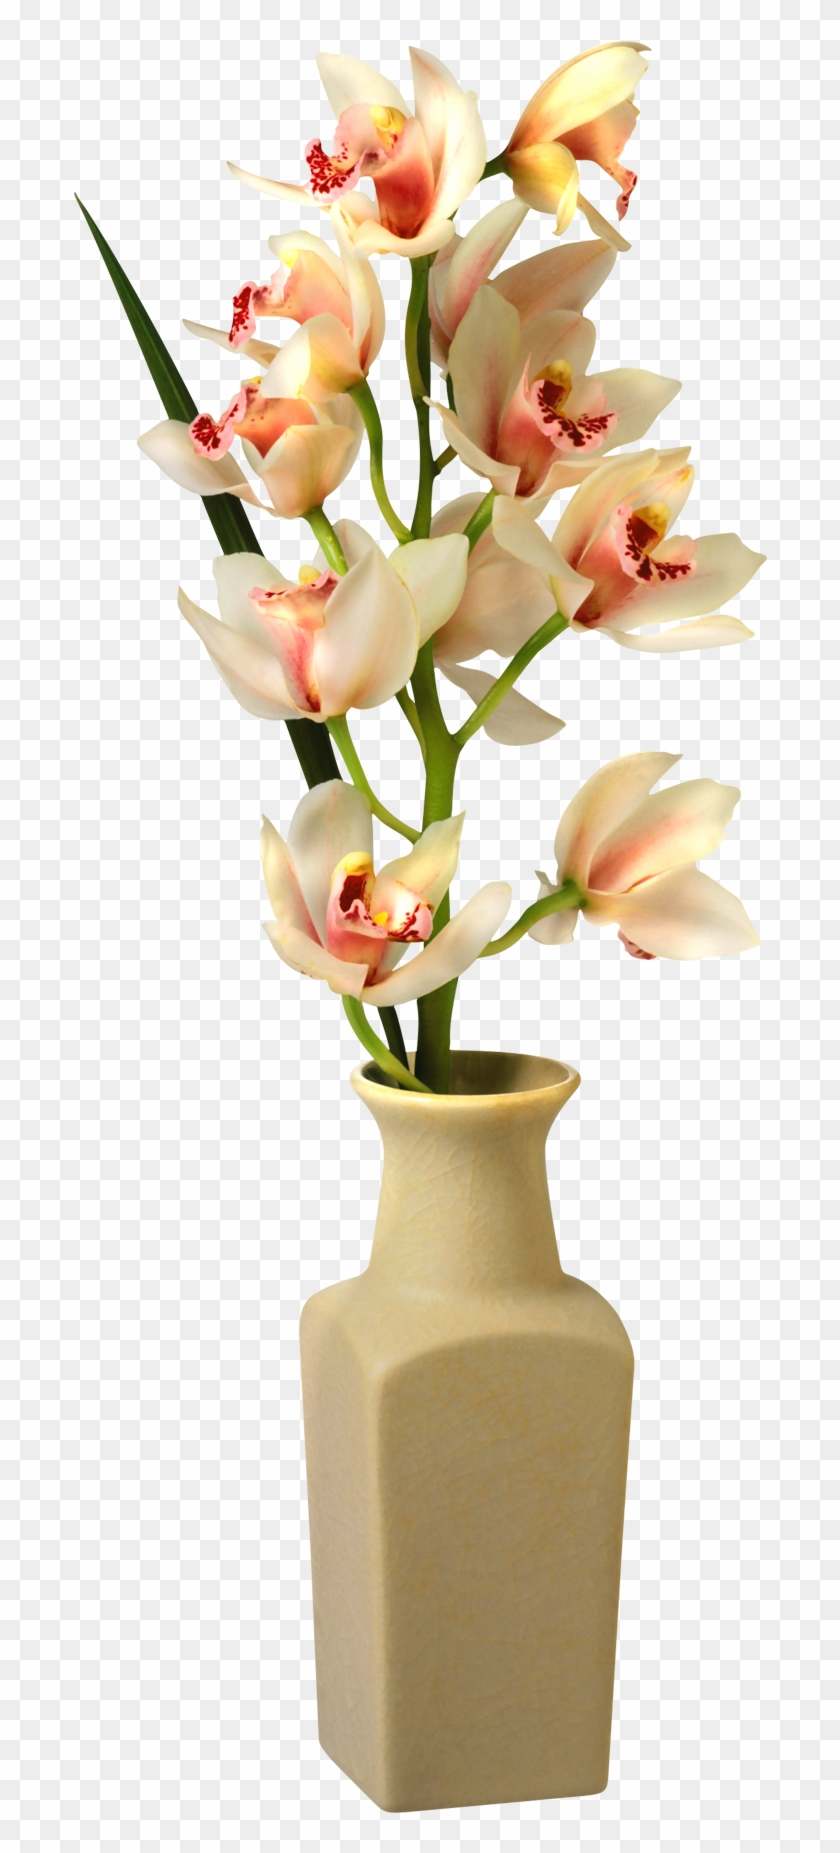 Transparent Flowers In Vase Png, Png Download.